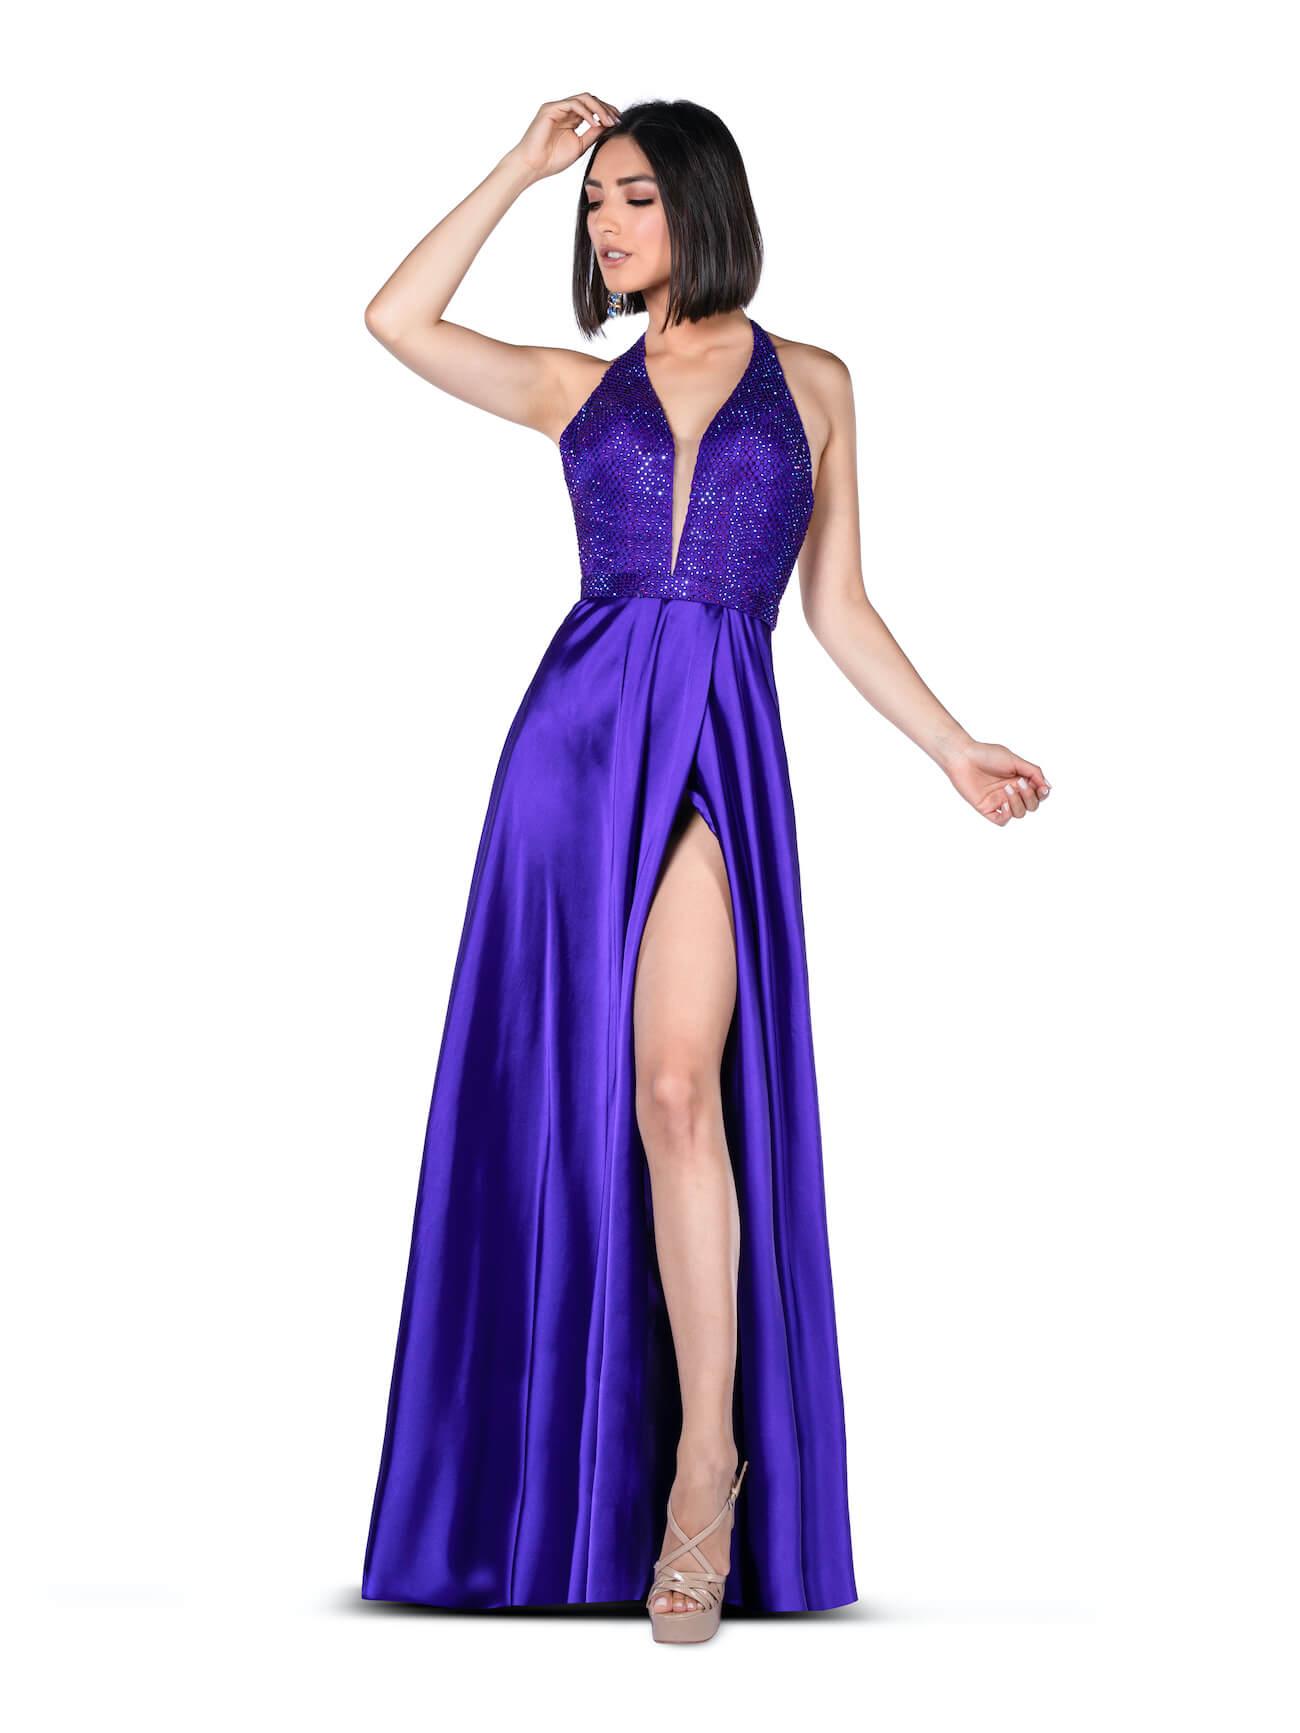 Queenly size 0 Vienna Purple Side slit evening gown/formal dress